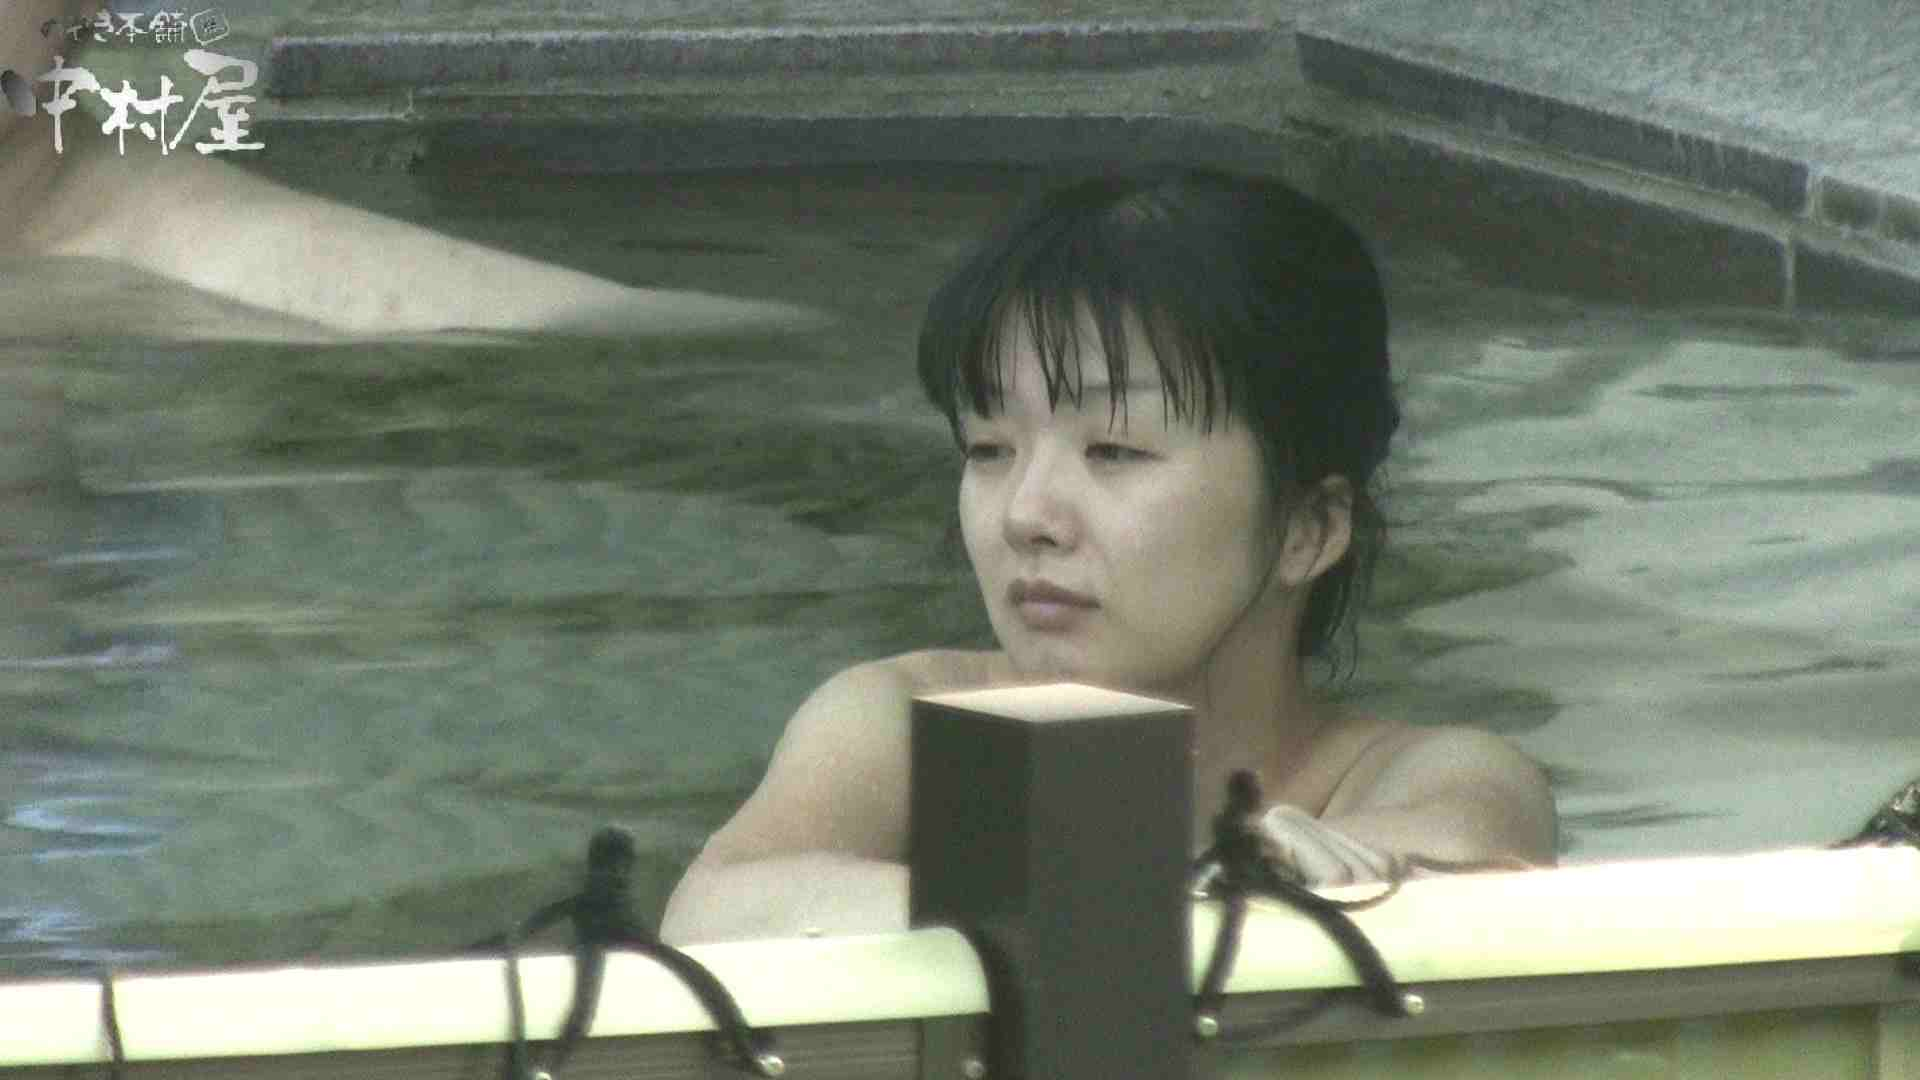 Aquaな露天風呂Vol.904 OL  60連発 31